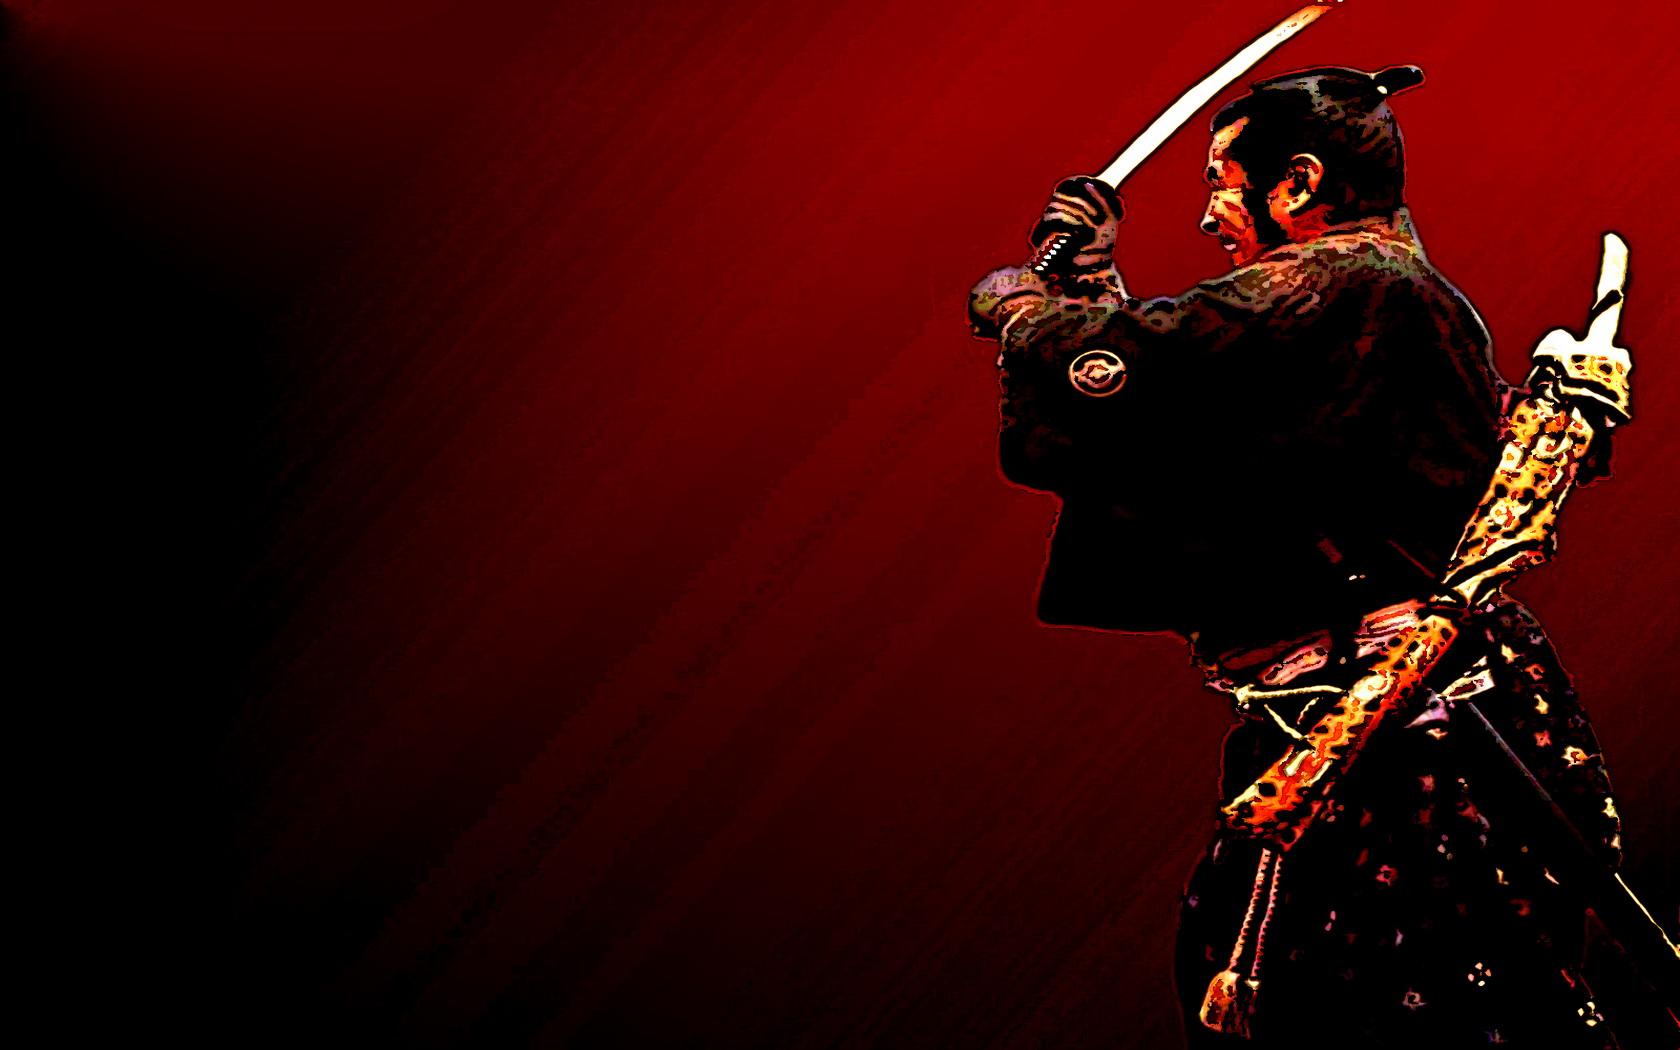 samurai wallpaper and background image 1680x1050 id391055